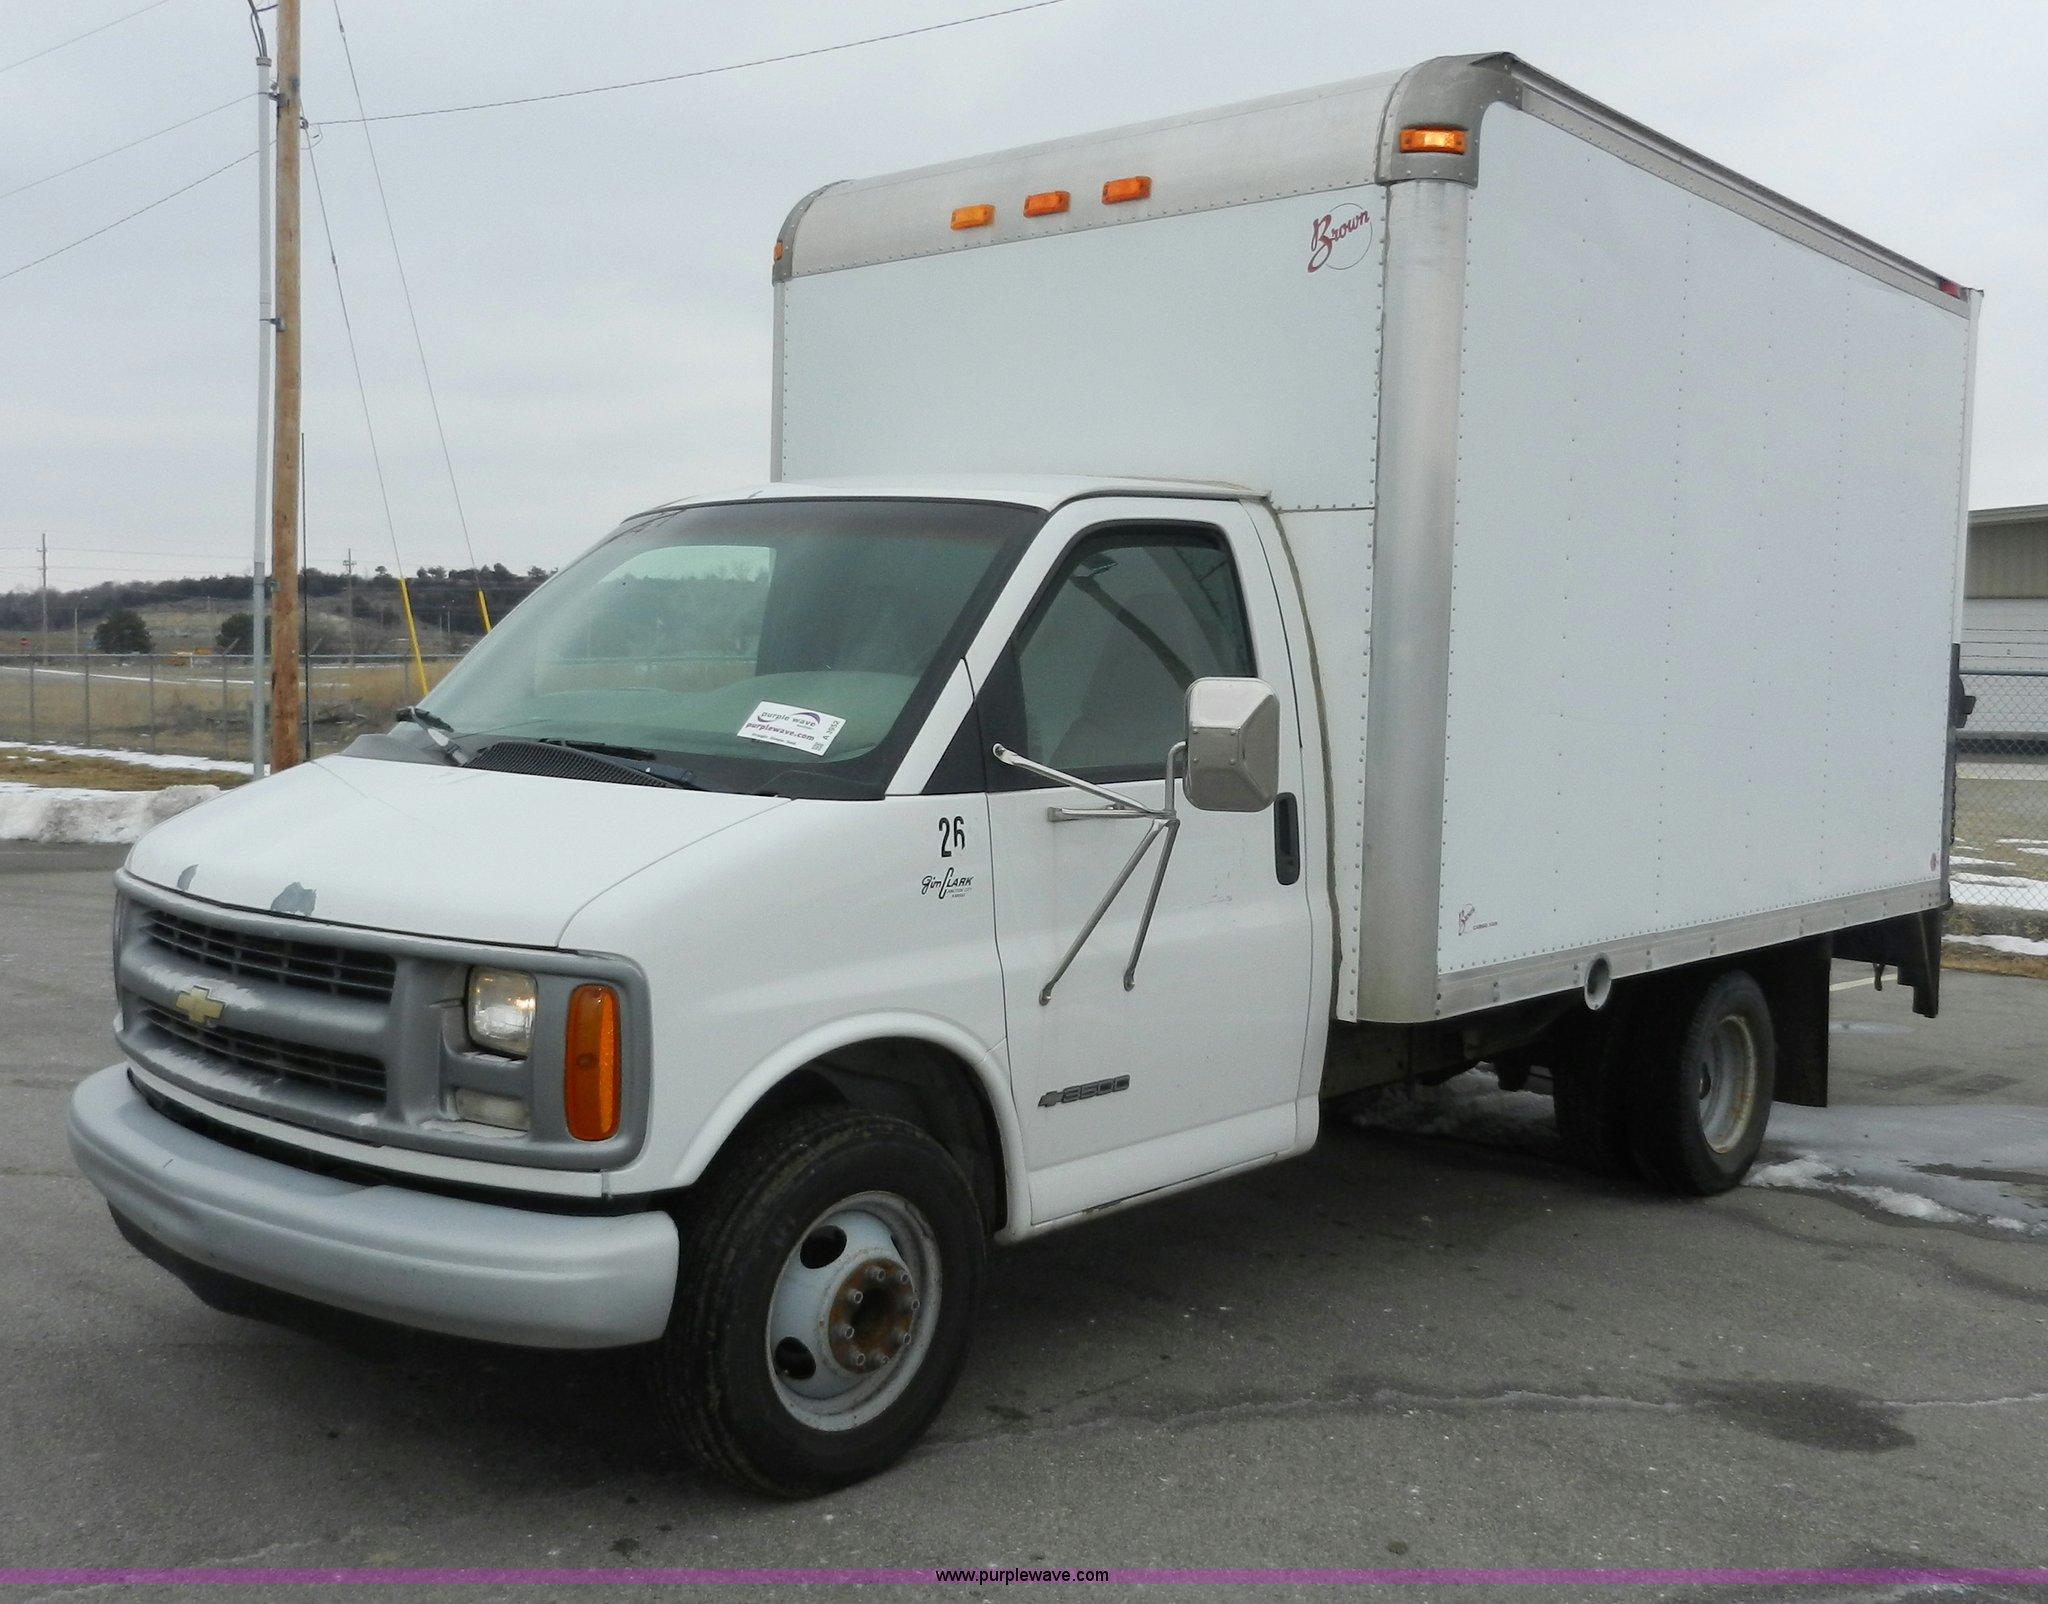 1999 chevrolet express 3500 cargo box truck item a3952 s rh purplewave com chevy box truck 2003 1976 Chevy Truck